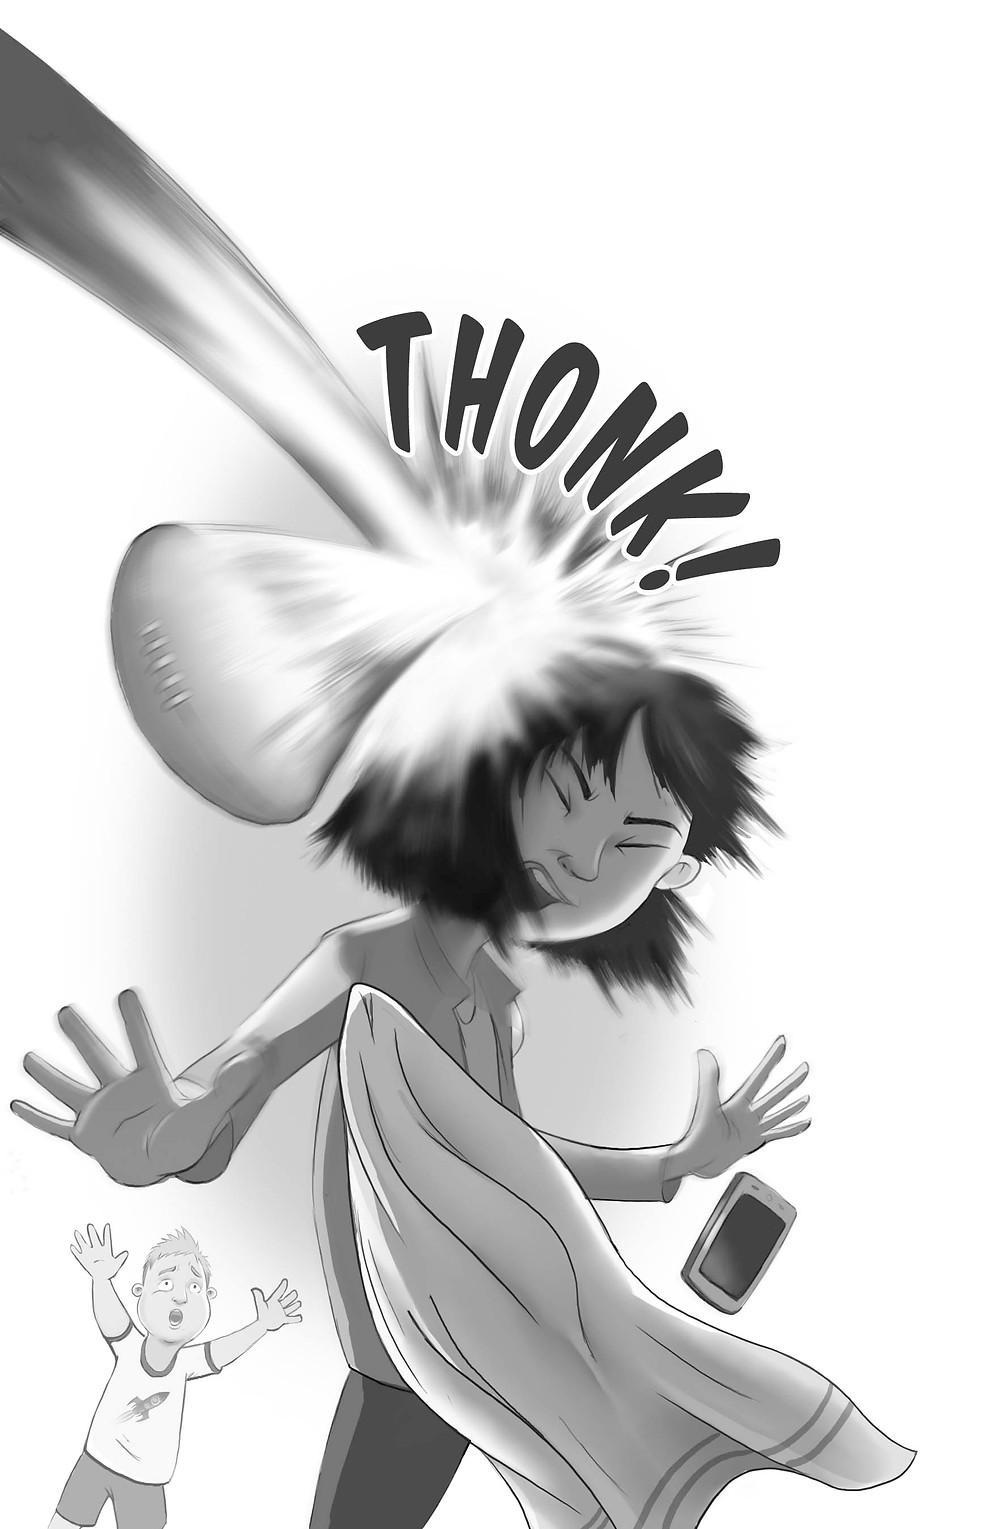 THONK